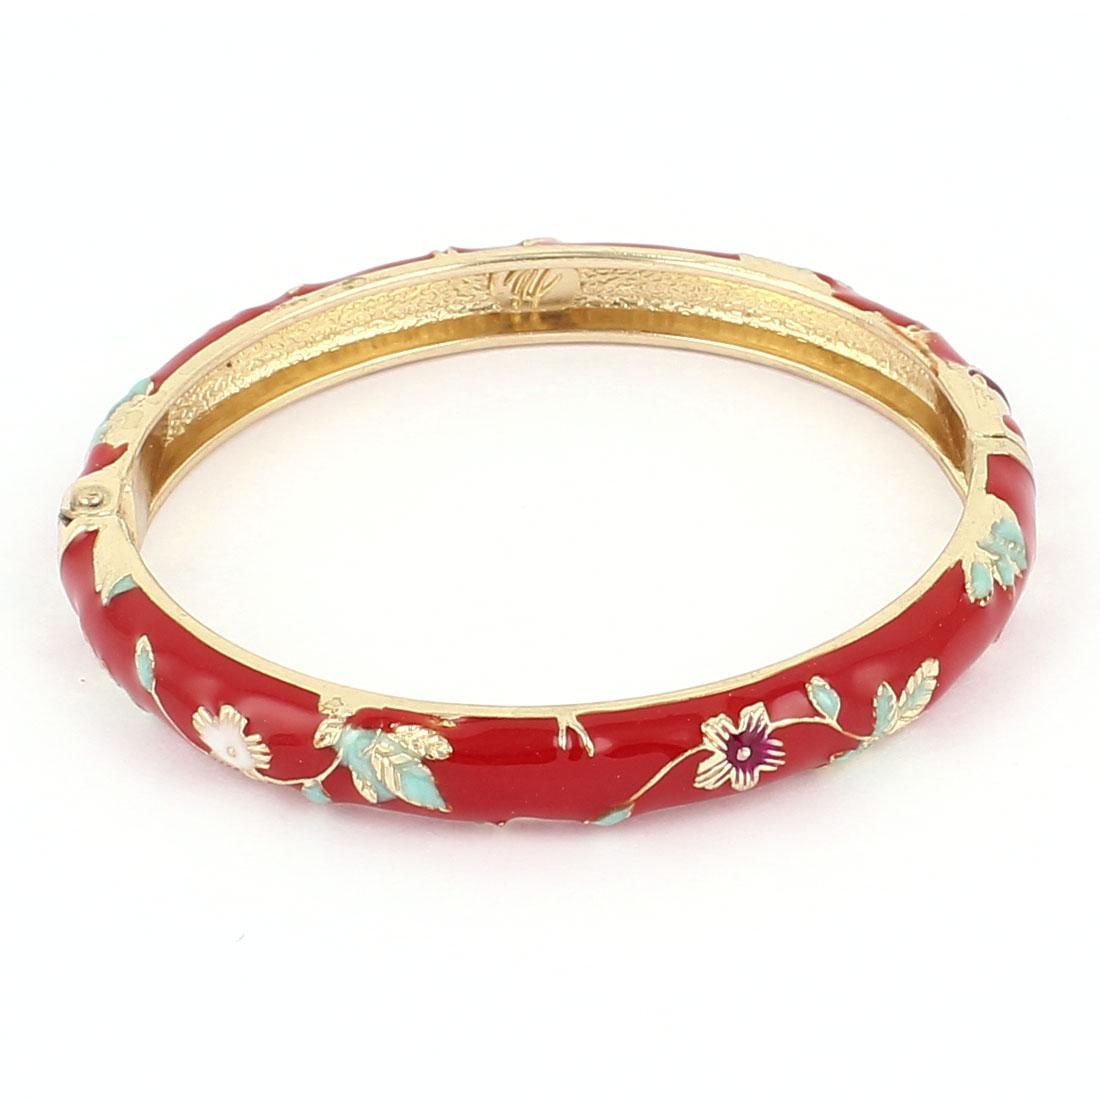 Lady Girl 2.3-inch Dia Round Shape Red Hinge Wrist Bracelet